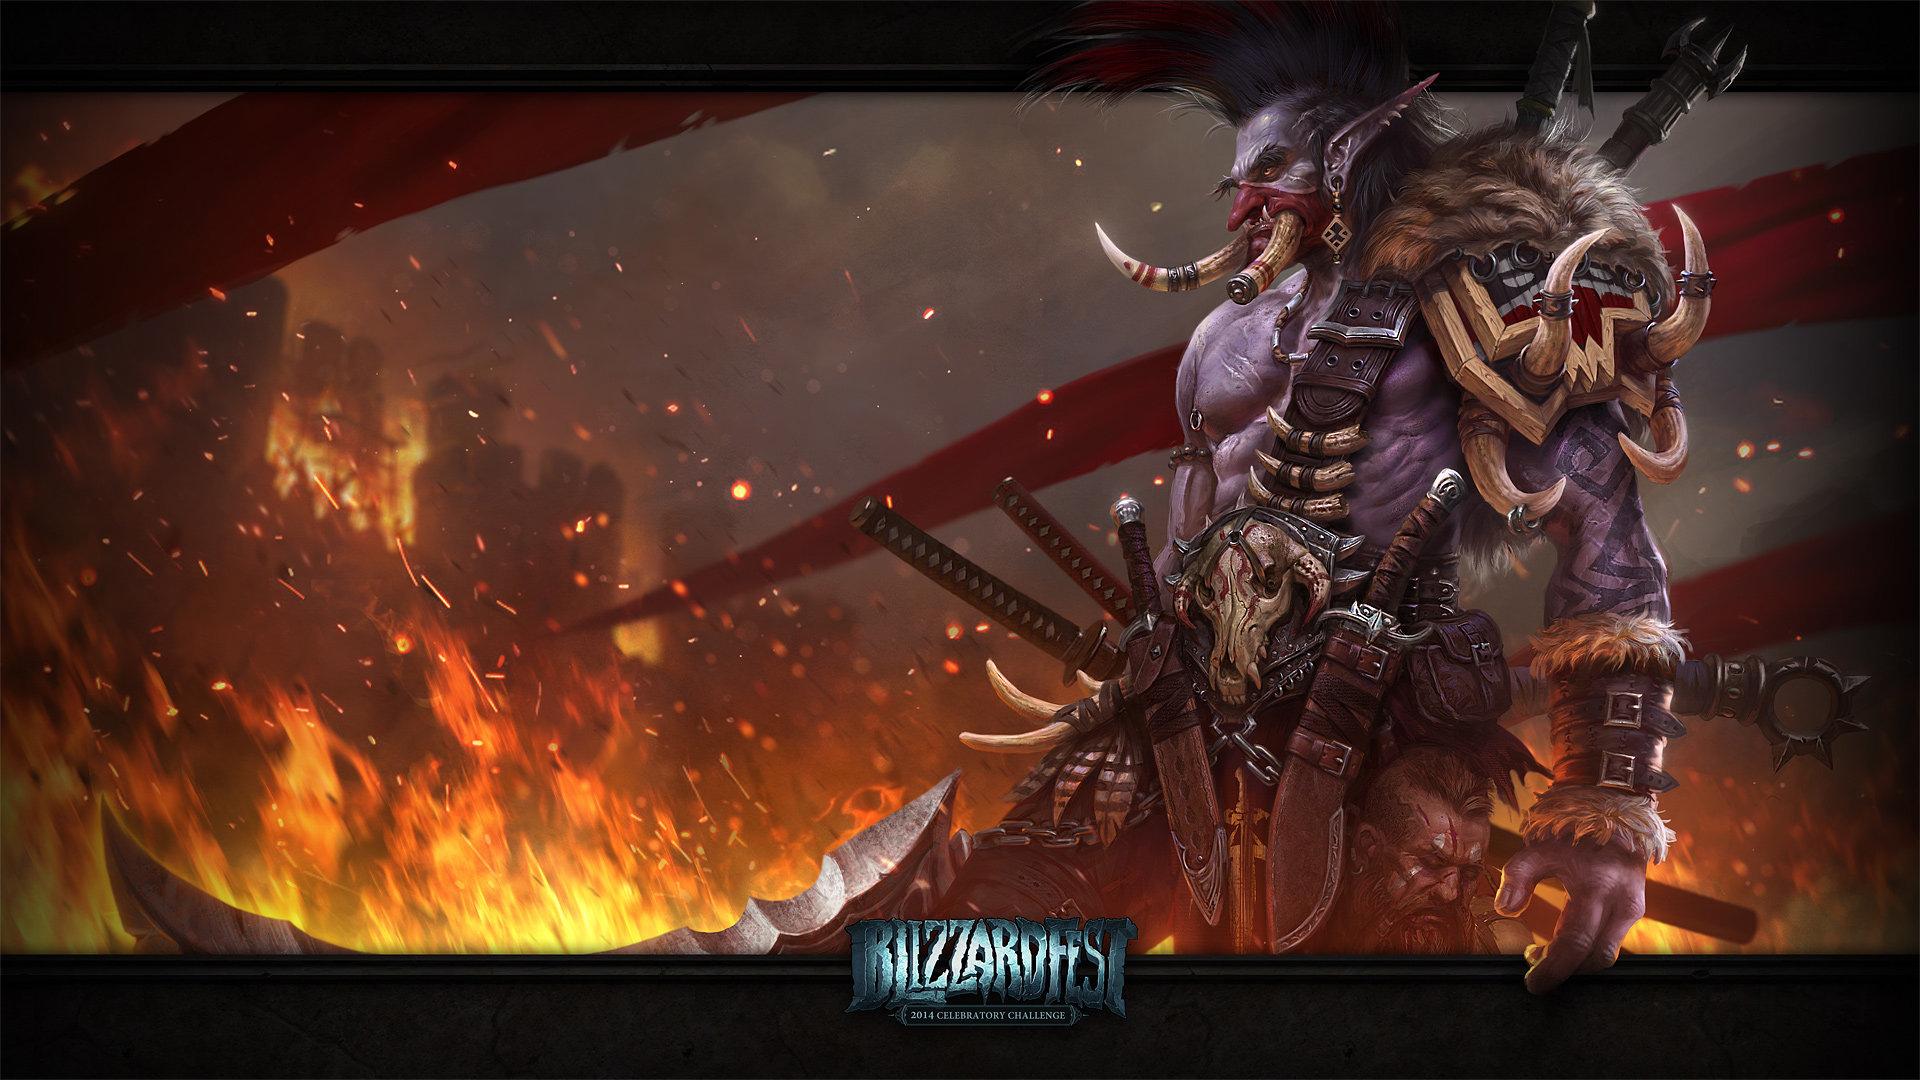 World Of Warcraft Fond d'écran HD   Arrière-Plan   1920x1080   ID:548261 - Wallpaper Abyss